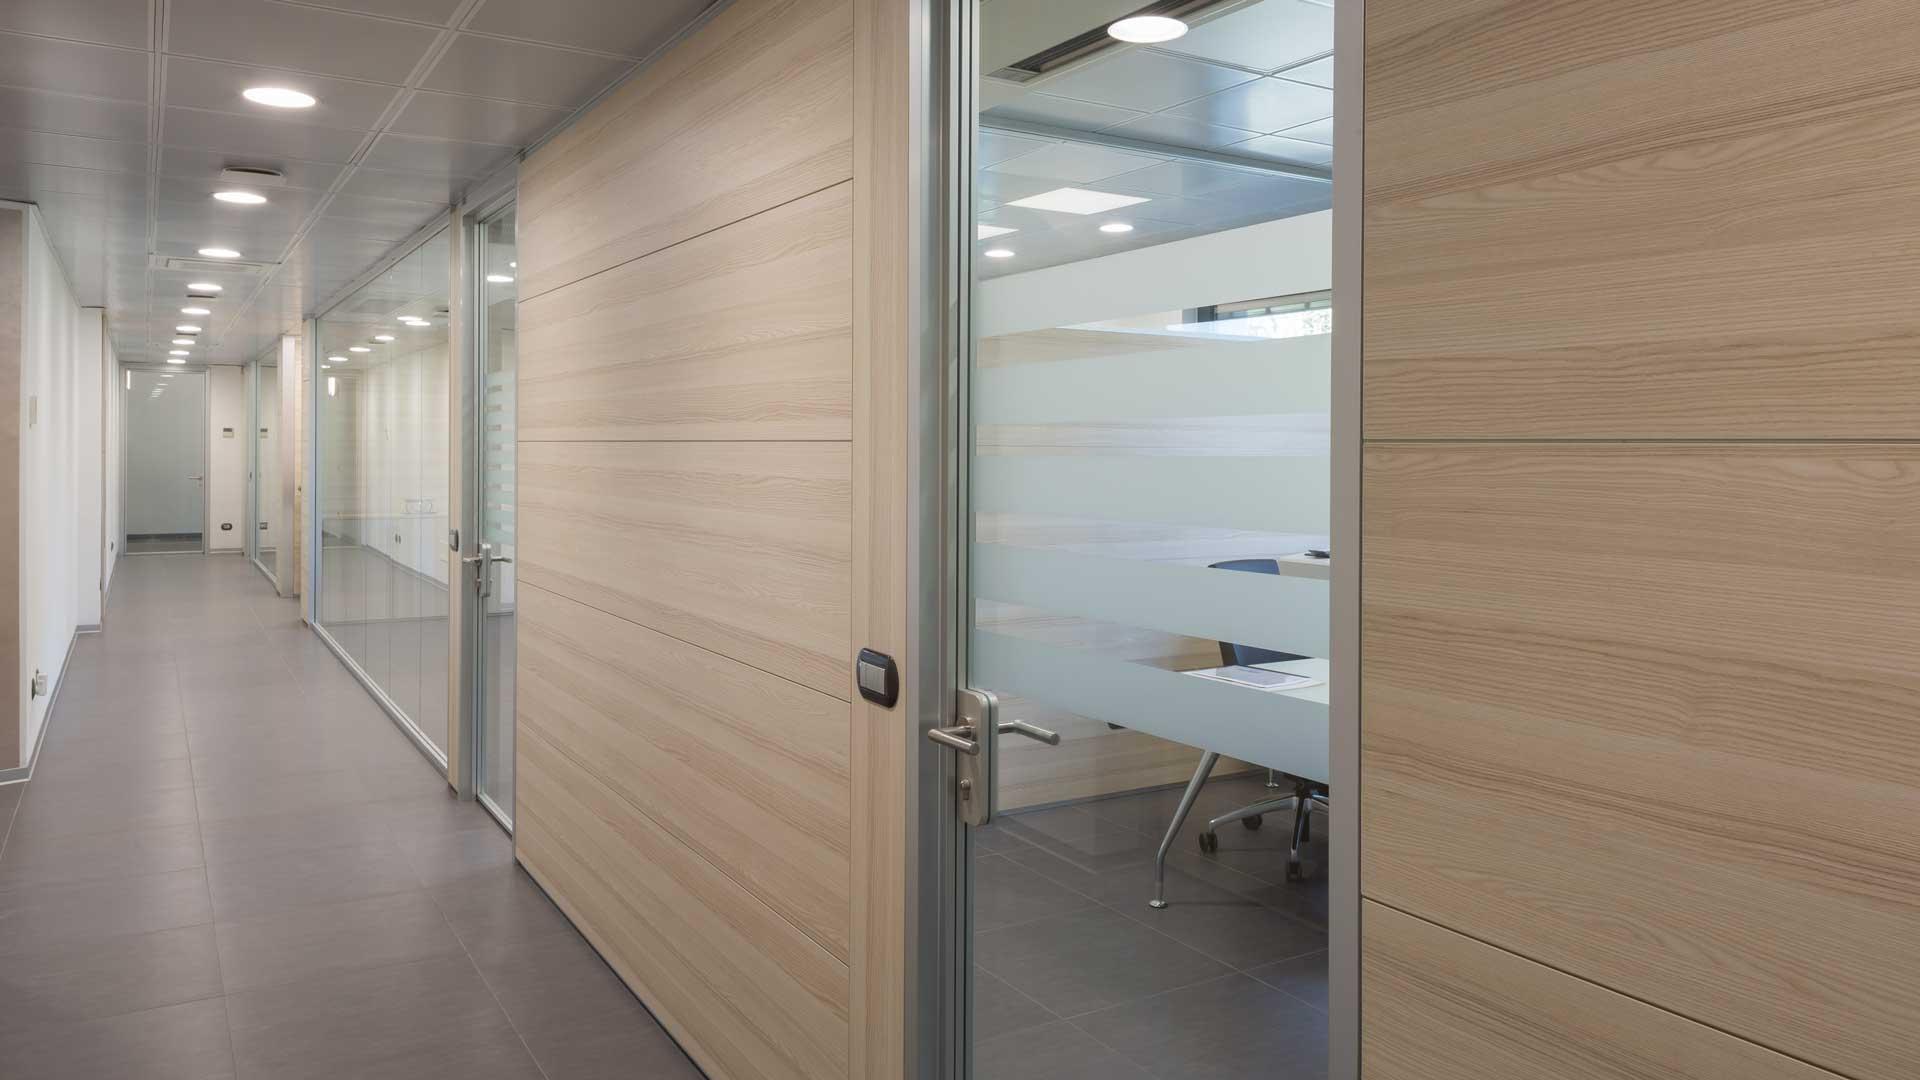 Pannelli-in-melaminico-pareti-divisorie-Level-Office-Landscape